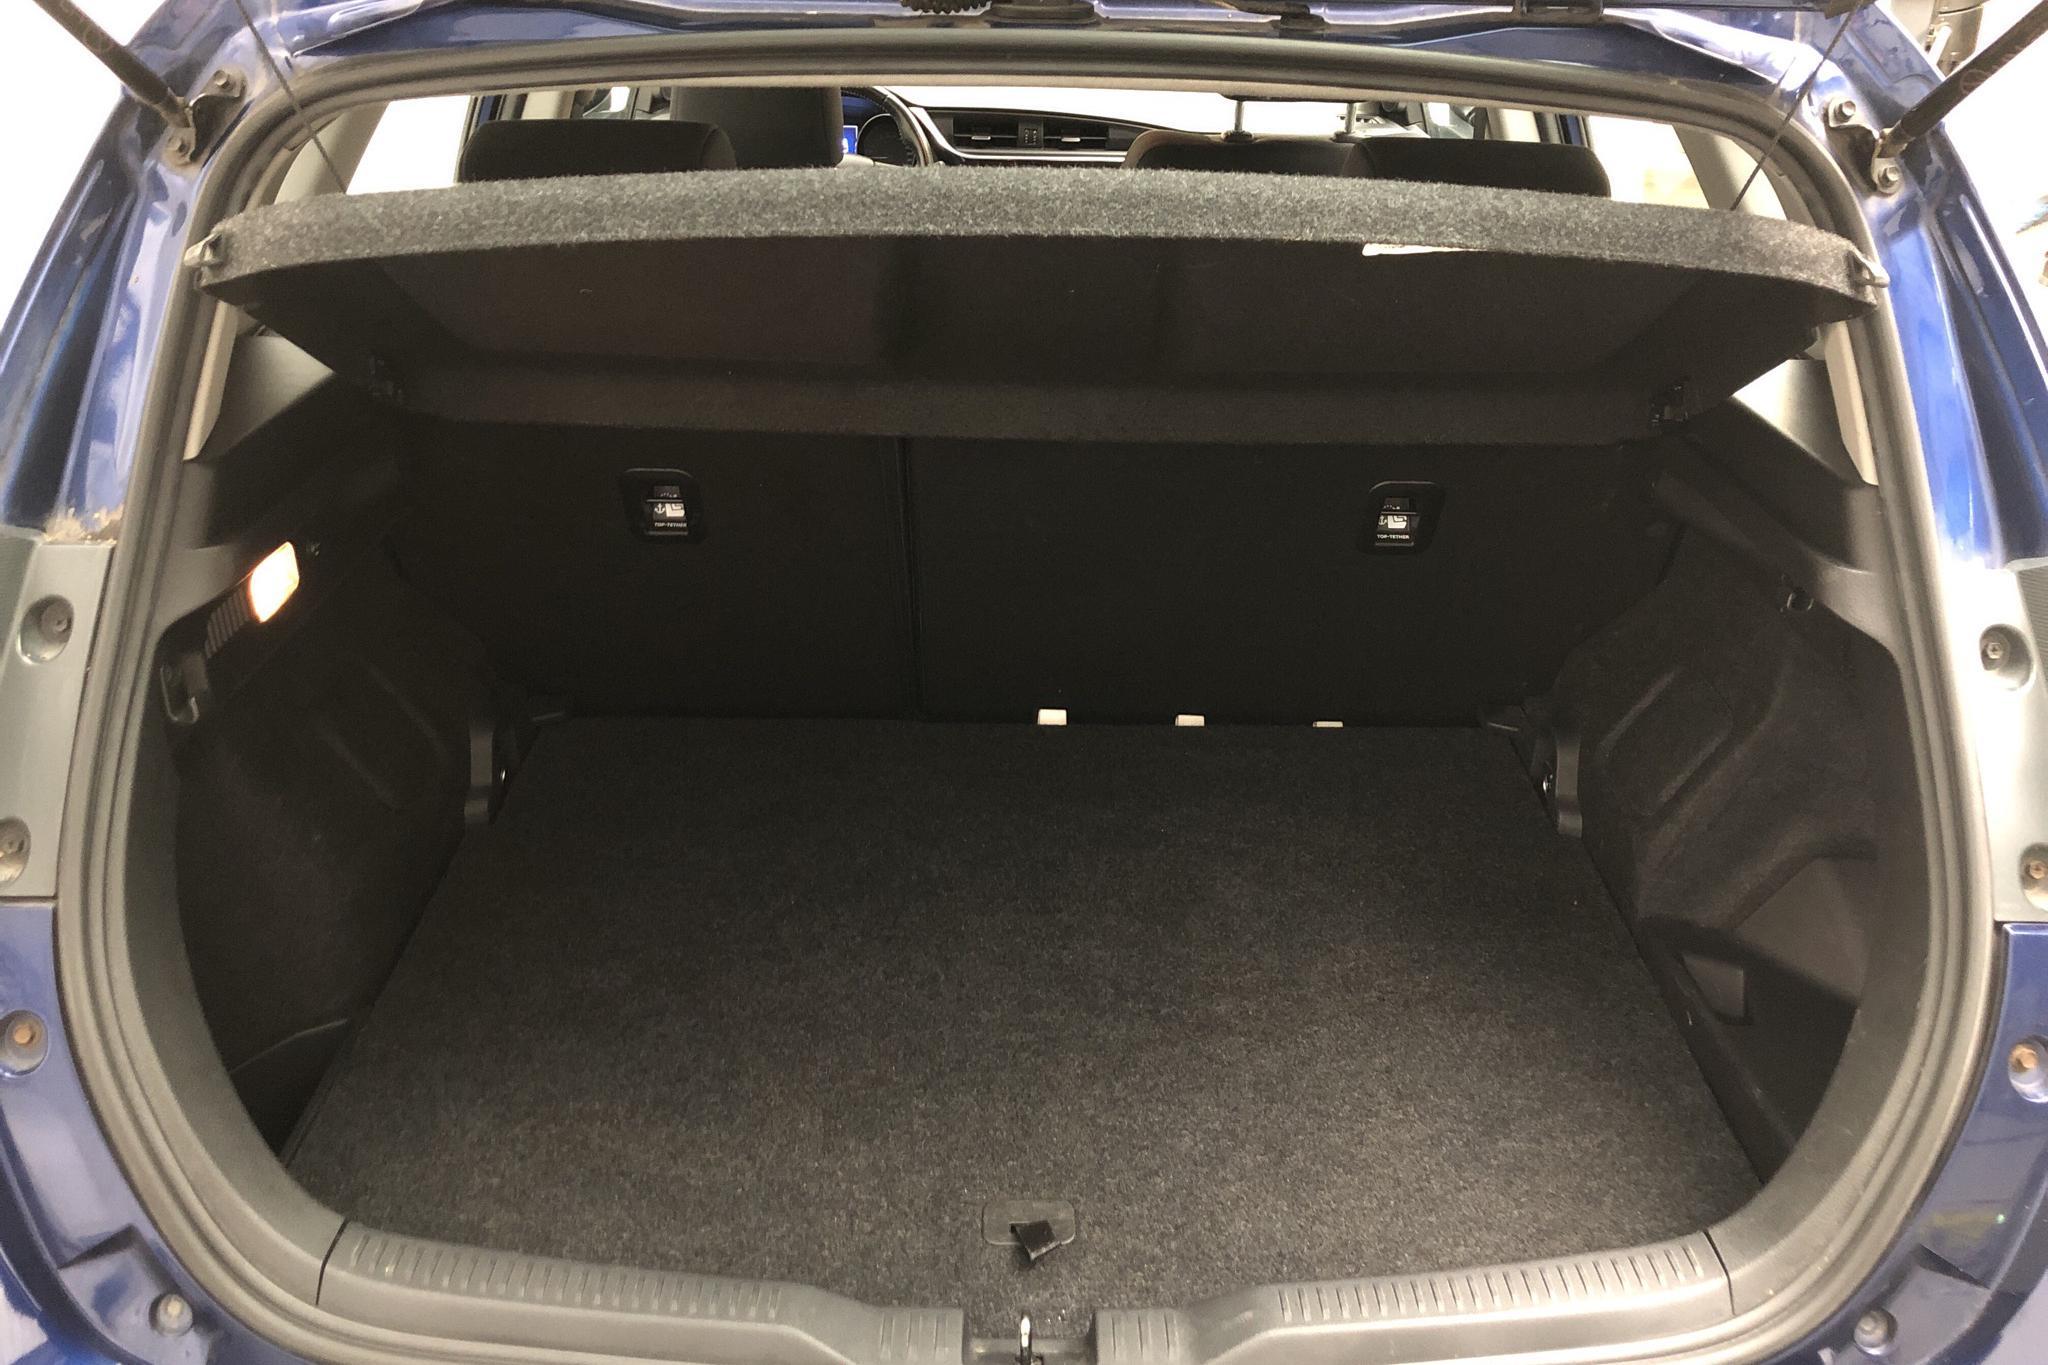 Toyota Auris 1.8 HSD 5dr (99hk) - 153 010 km - Automatic - Dark Blue - 2017